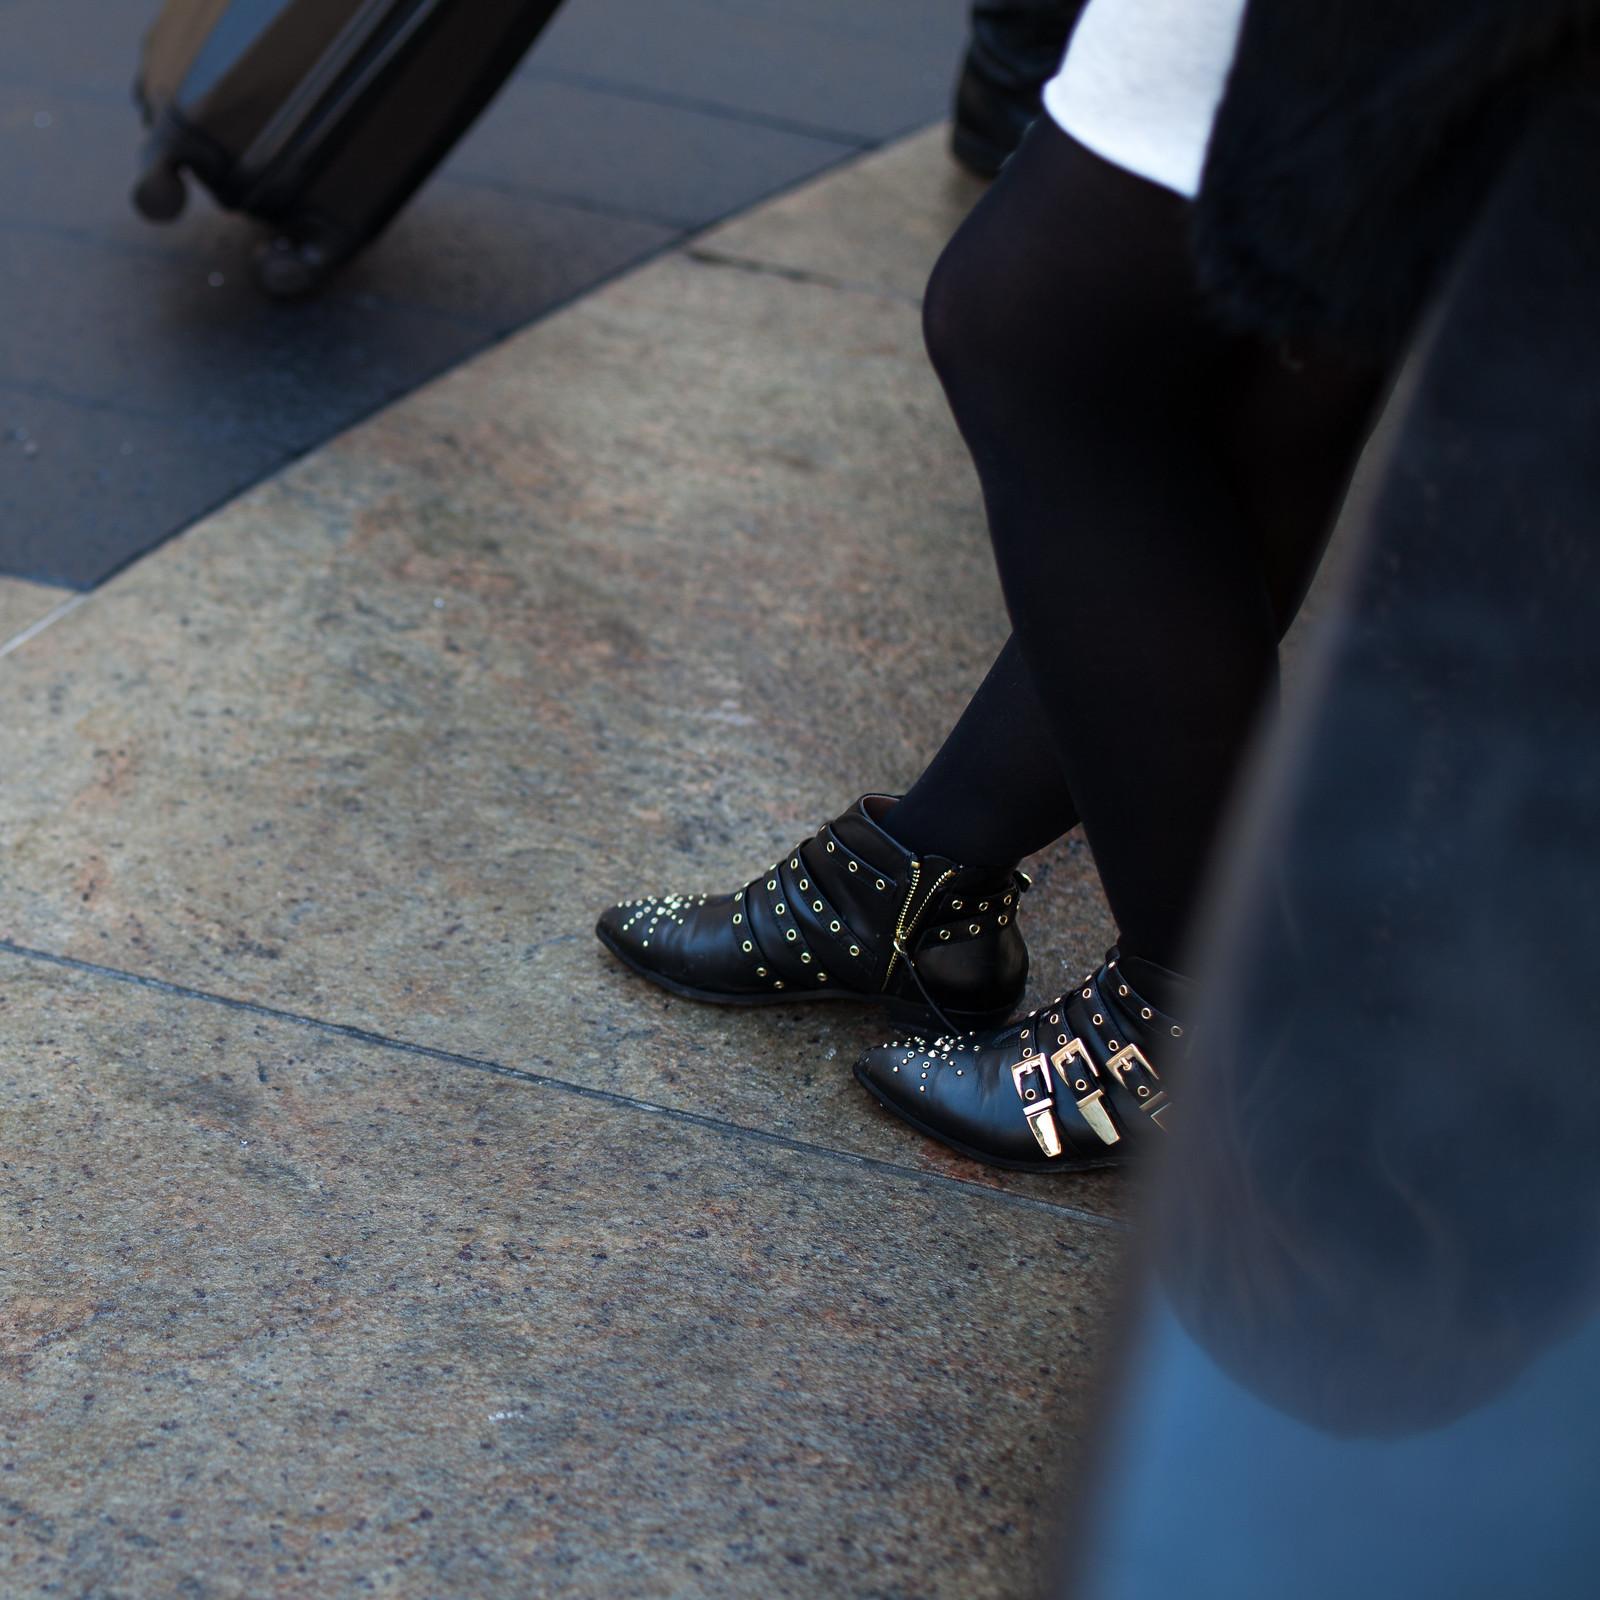 Shoes by wwward0